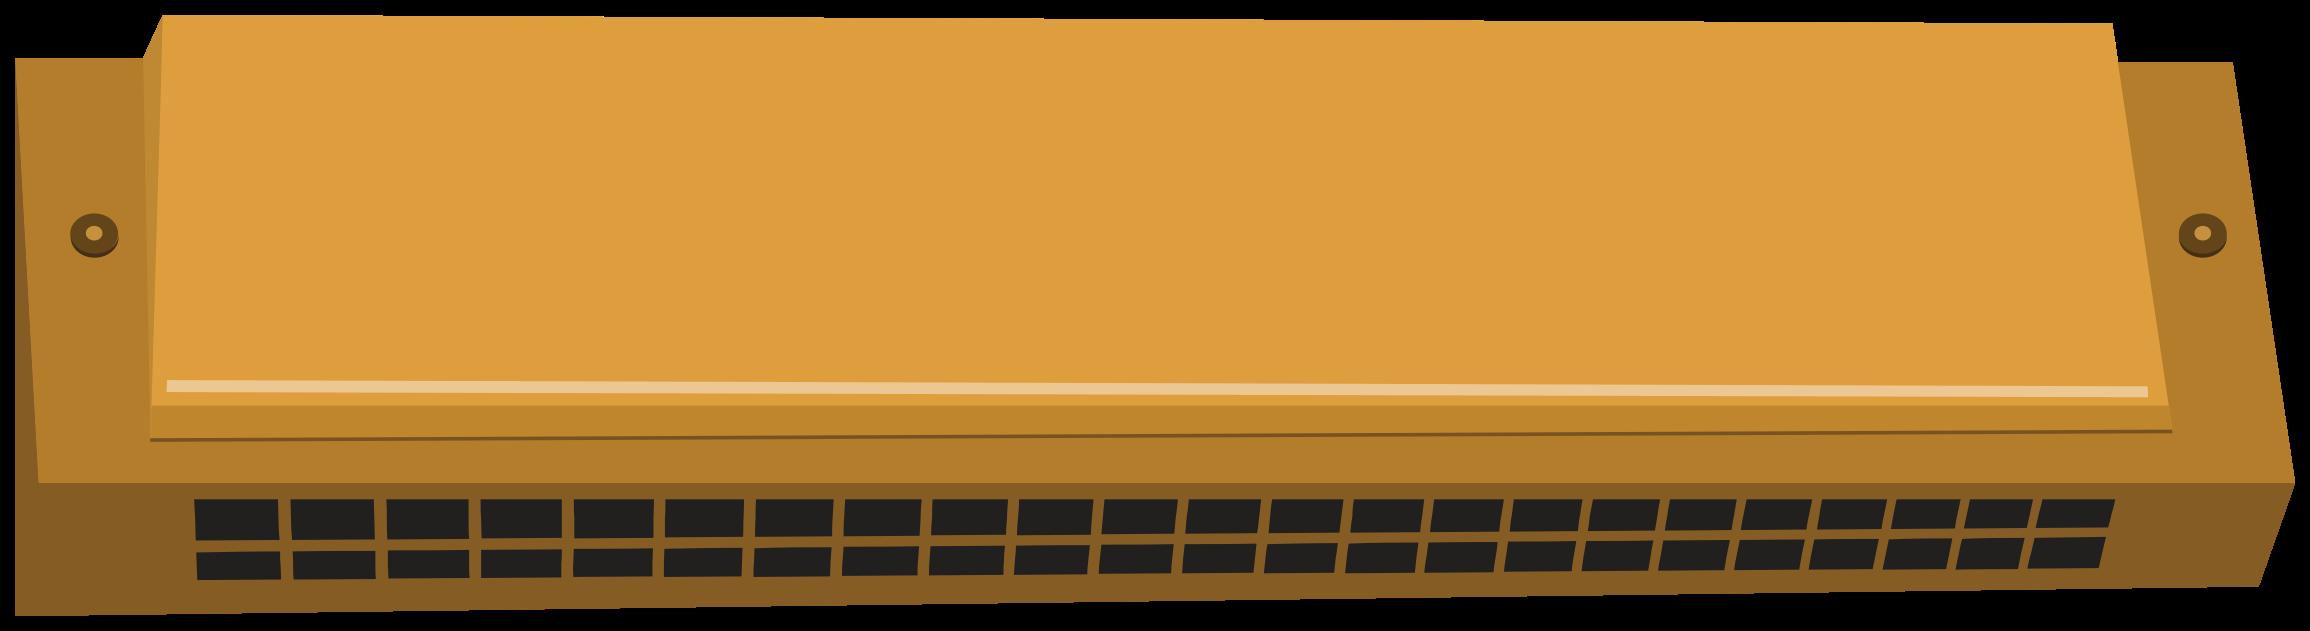 mondharmonica png